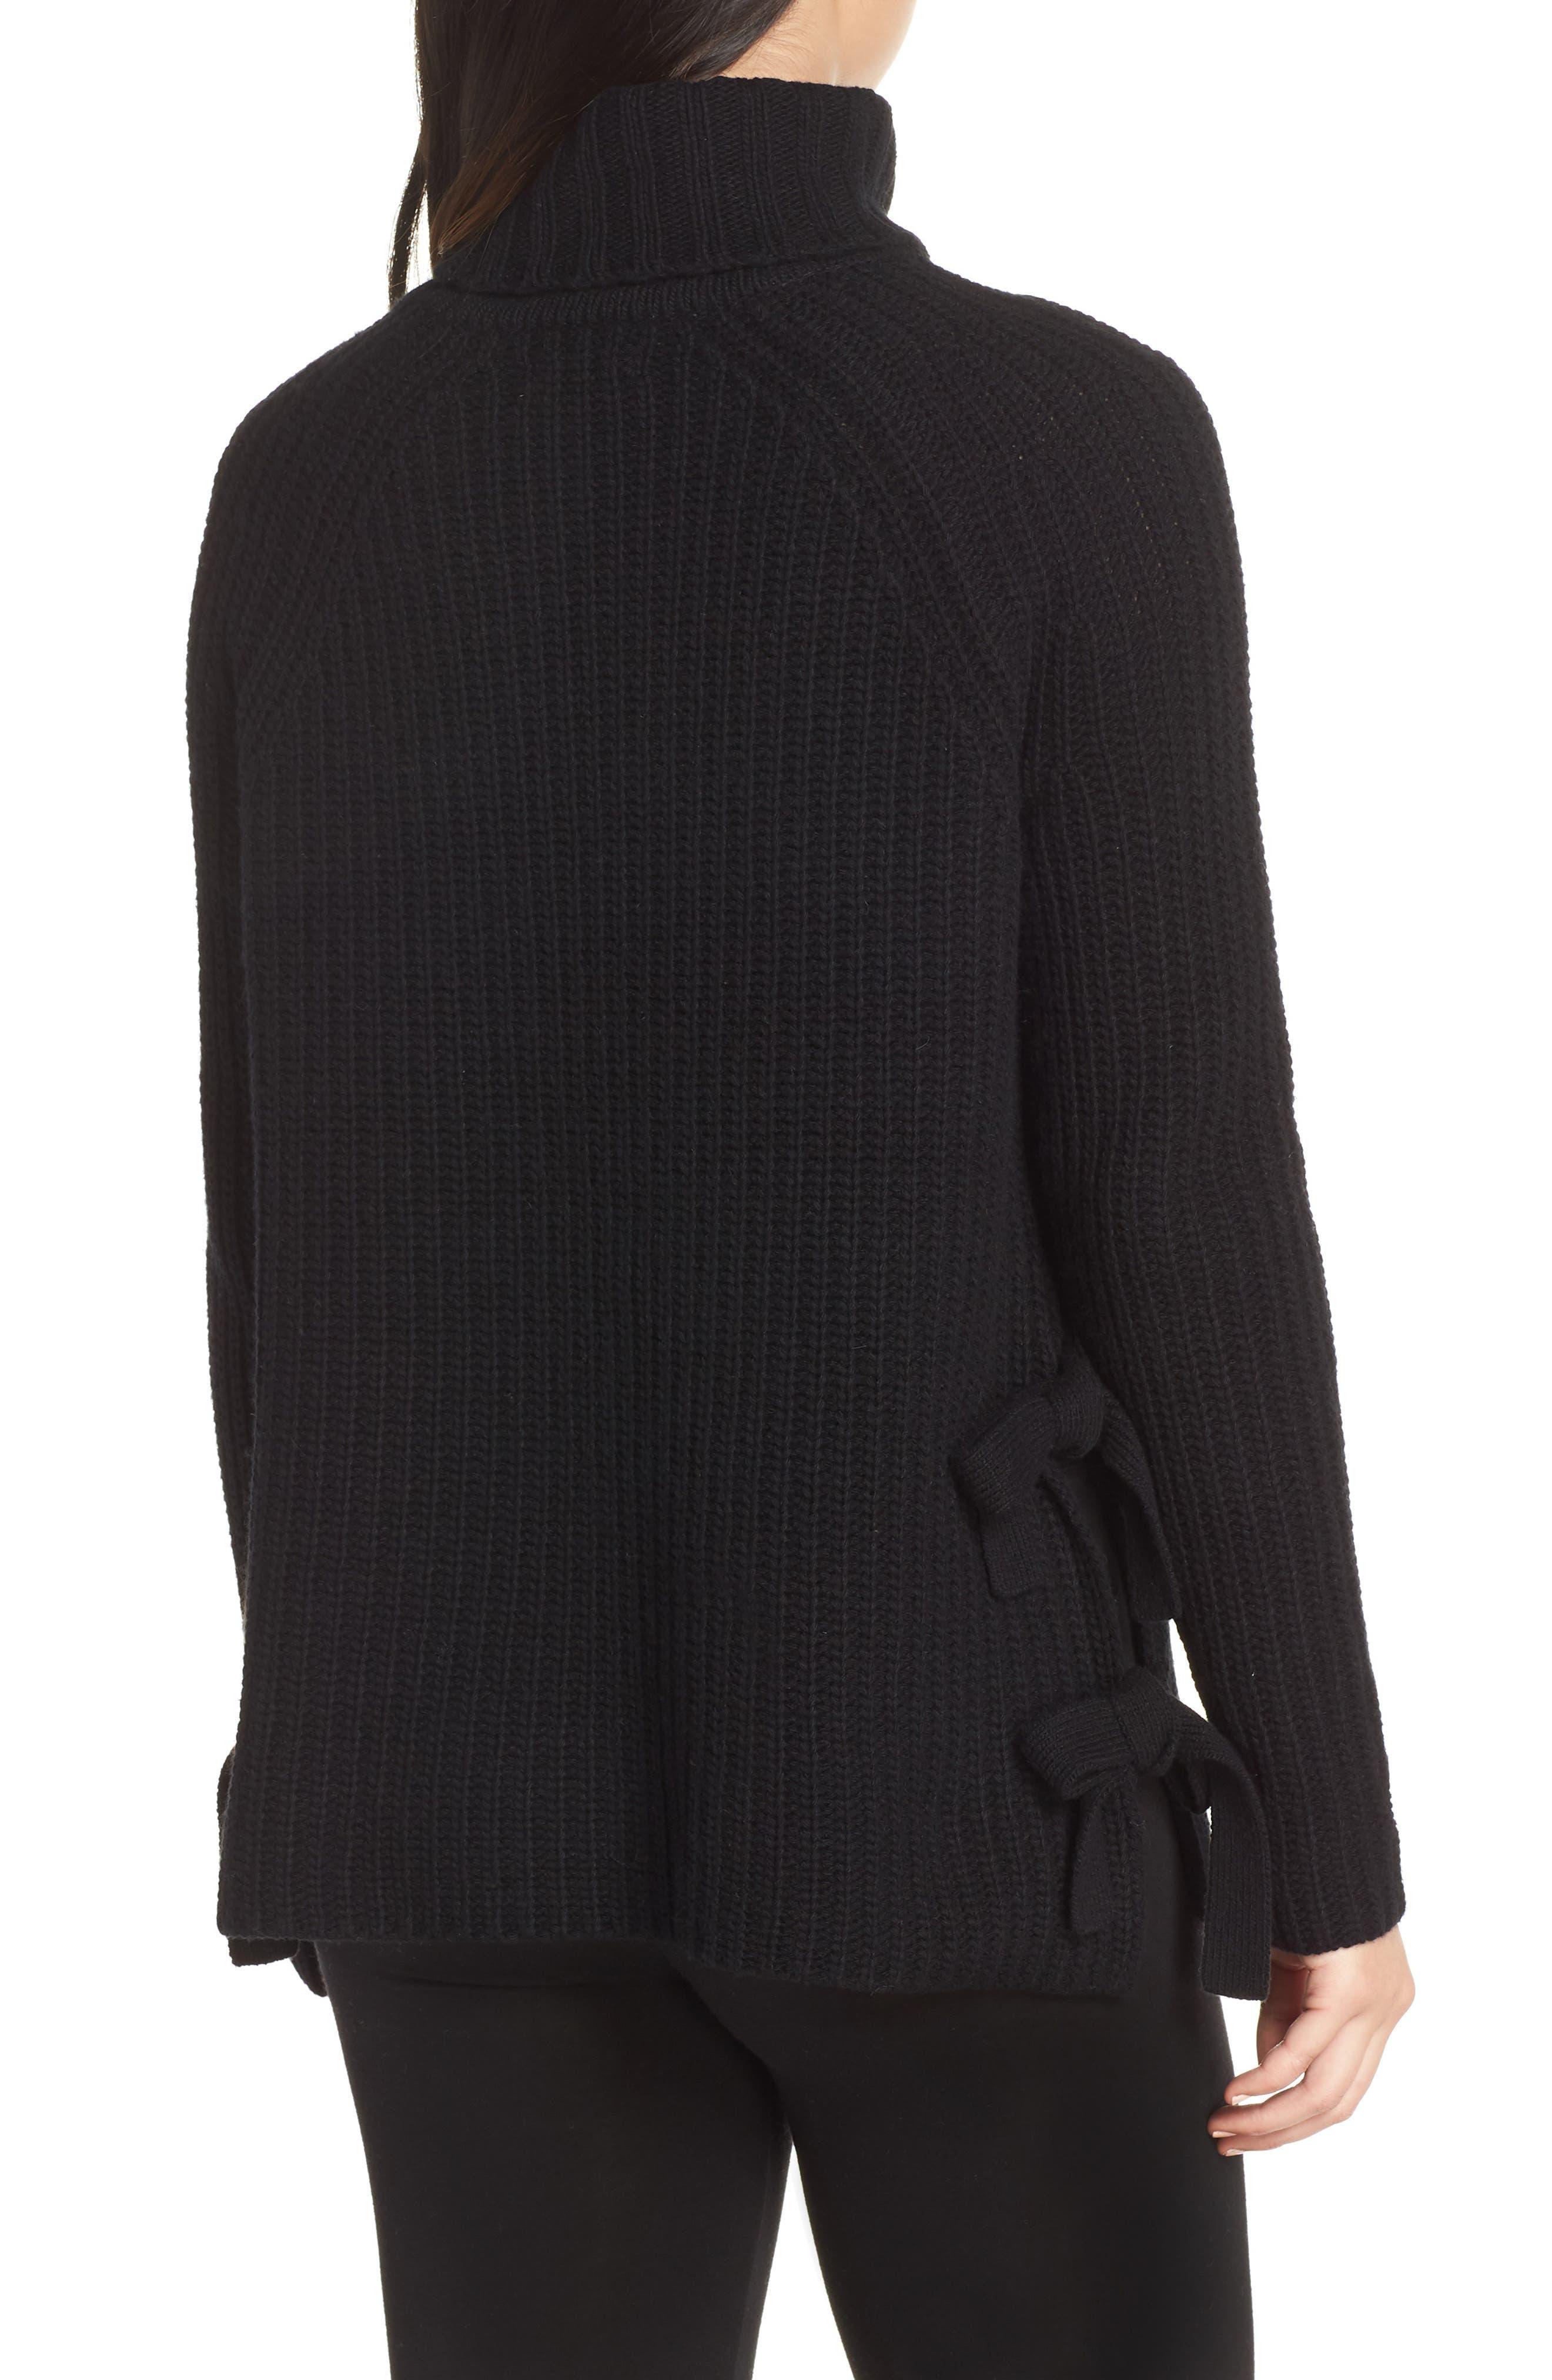 Ceanne Turtleneck Sweater,                             Alternate thumbnail 2, color,                             001